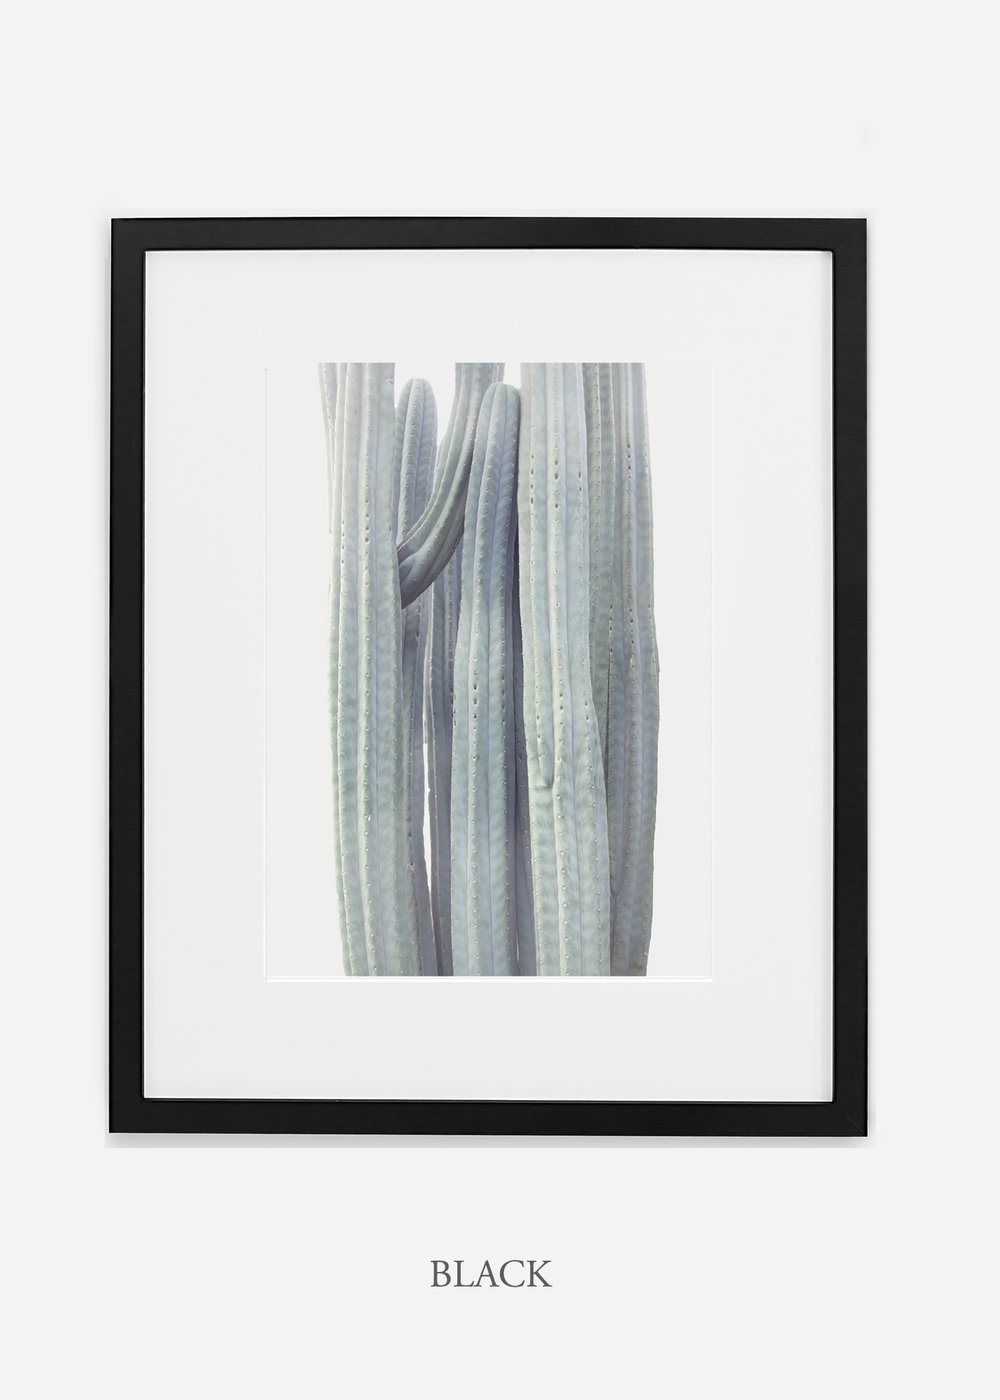 wildercalifornia_winterwhite_blackframe_interiordesign_white_neutral_cactus_art_photography_large.jpg